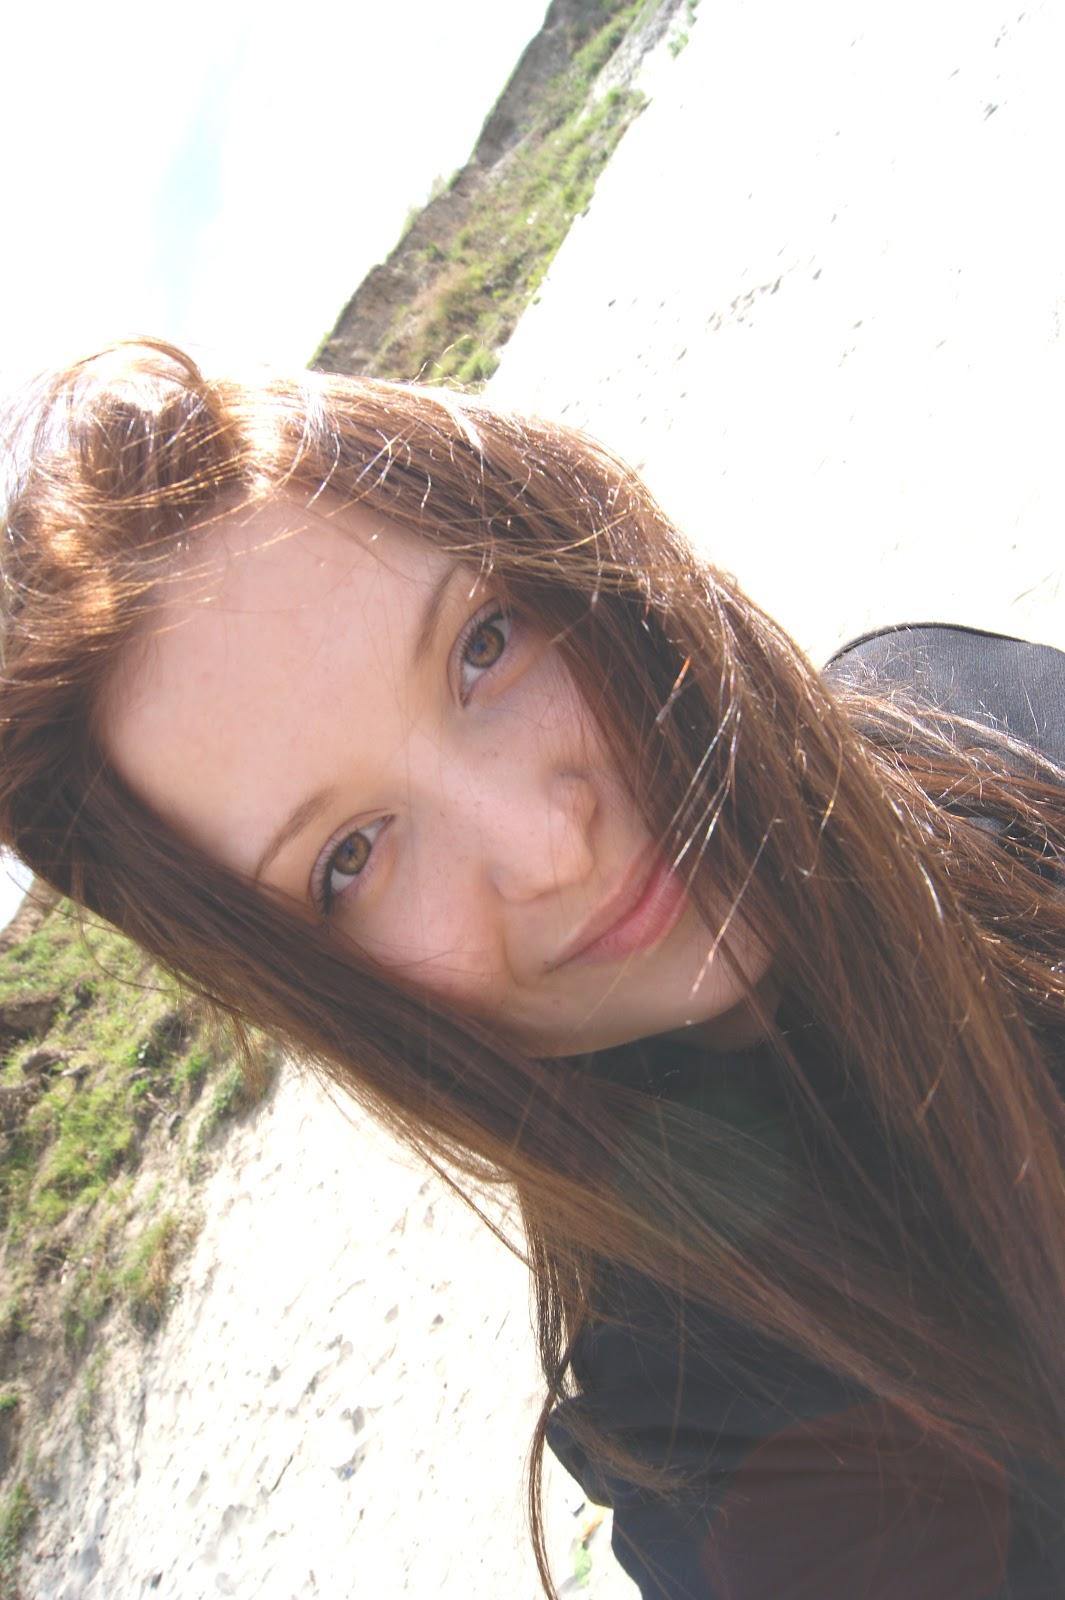 Elya Sabitova Naked On Couch | CLOUDY GIRL PICS